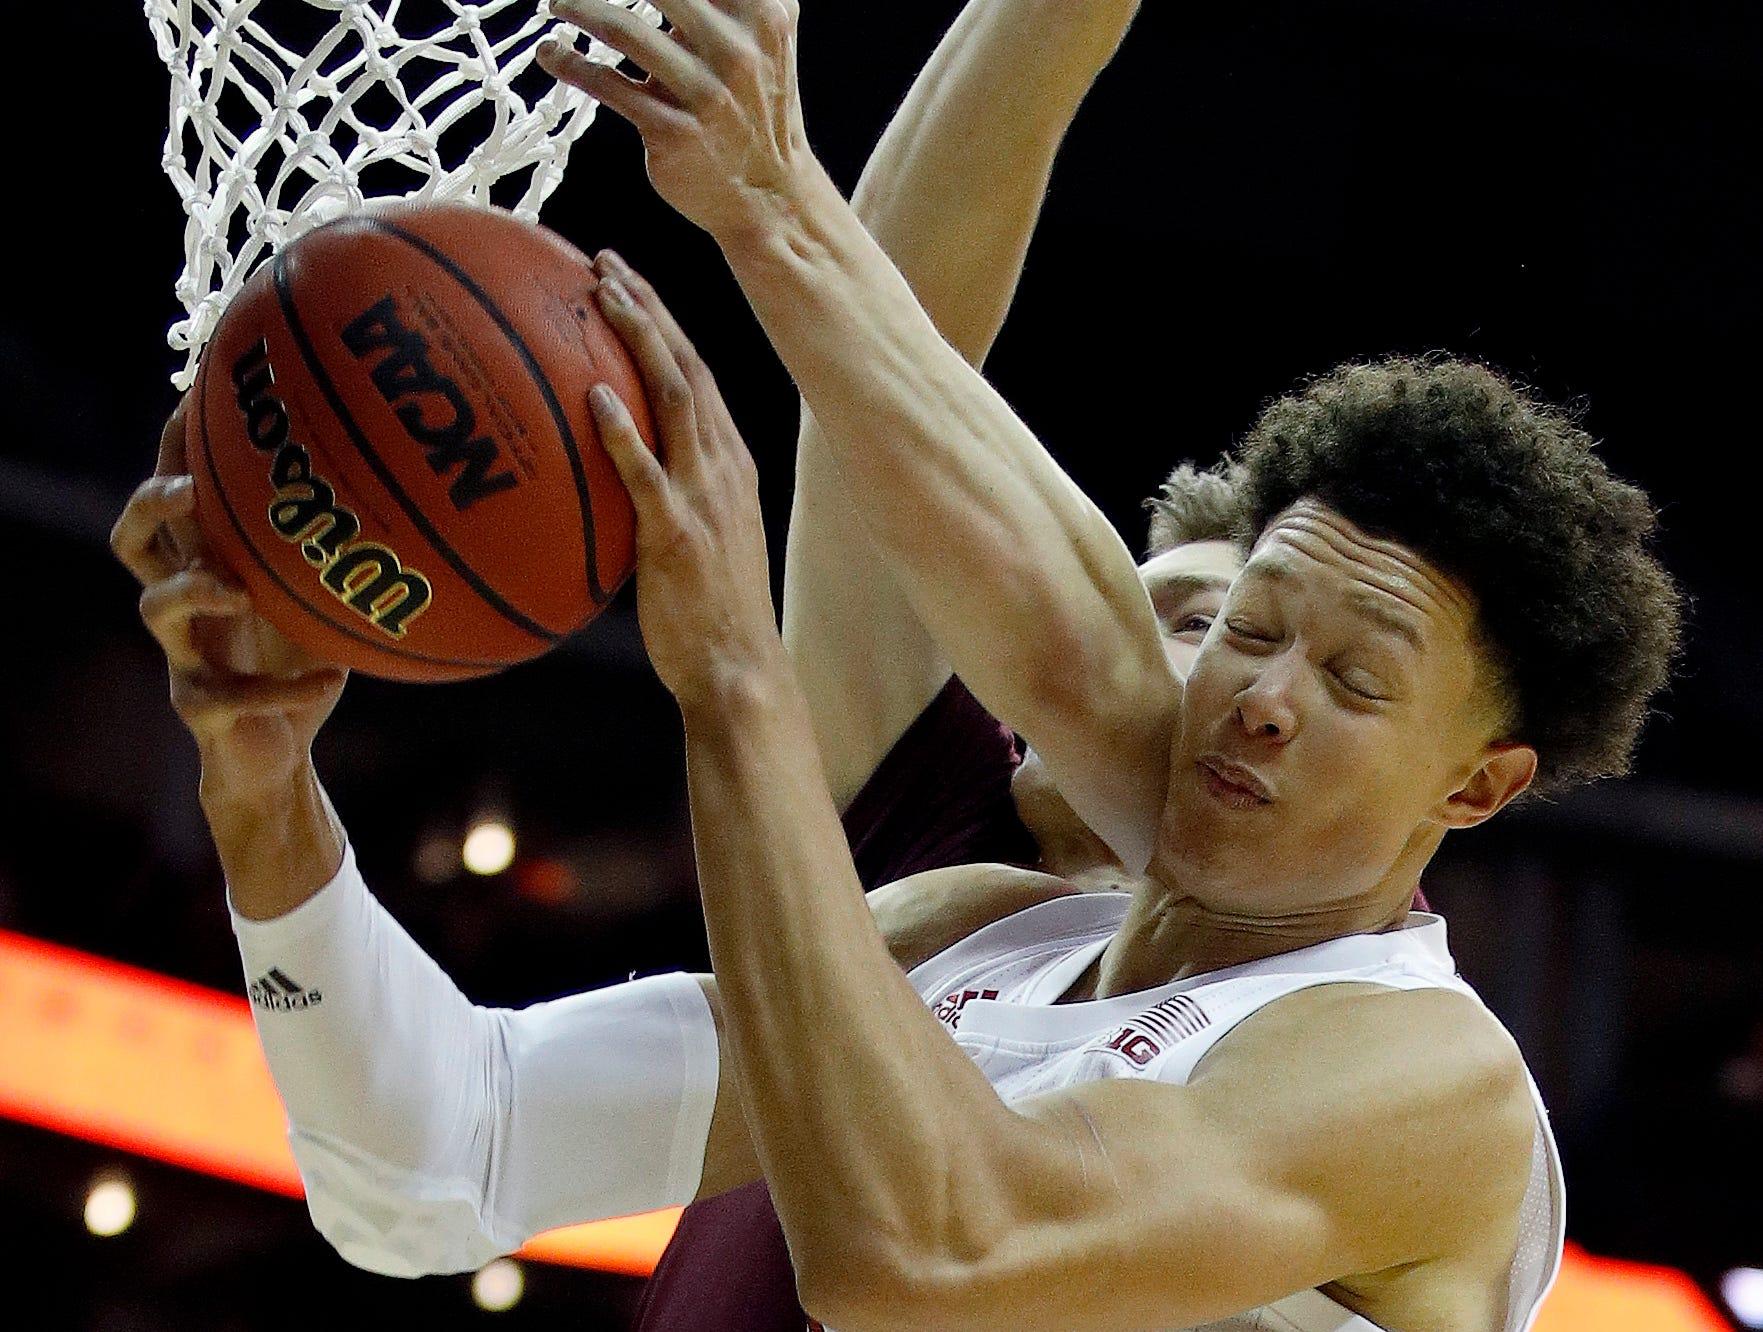 Nebraska's Isaiah Roby (15) beats Missouri State's Szymon Wojcik to a rebound during the second half of an NCAA college basketball game Monday, Nov. 19, 2018, in Kansas City, Mo. Nebraska won the game 85-62. (AP Photo/Charlie Riedel)